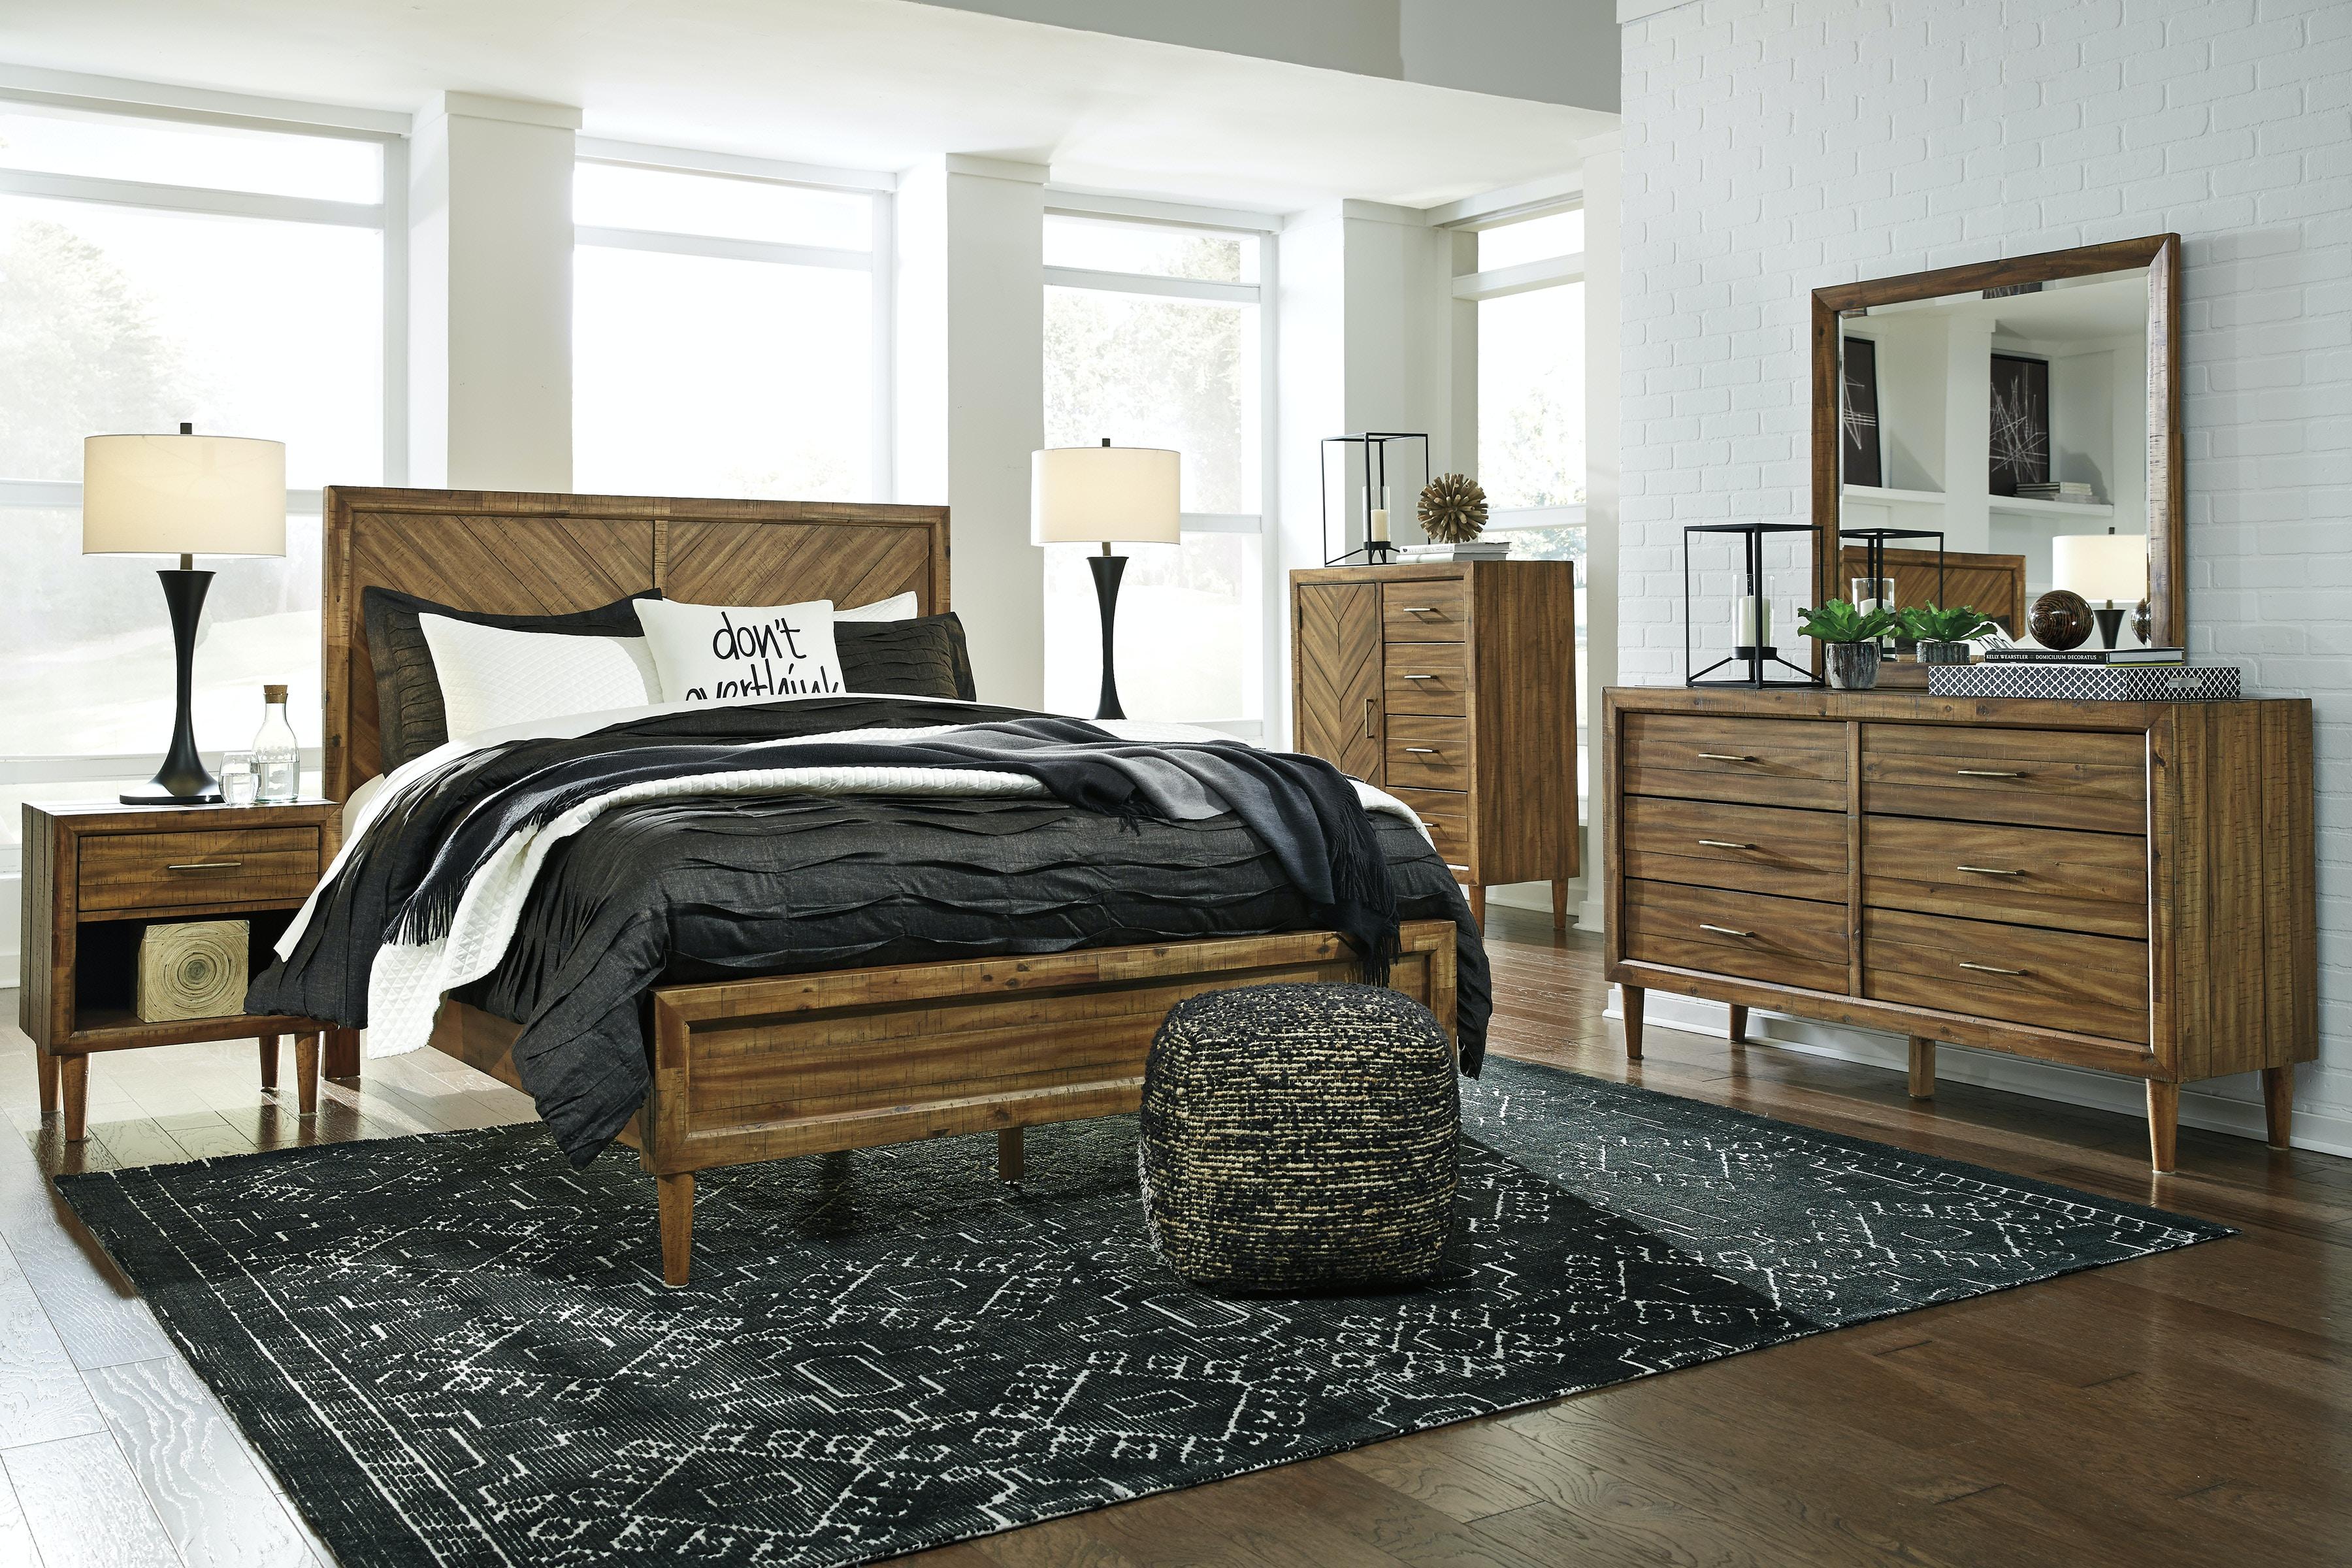 Ordinaire Signature Design By Ashley 6pc Broshtan Mid Century Modern Acacia Bedroom  Set B518 31/